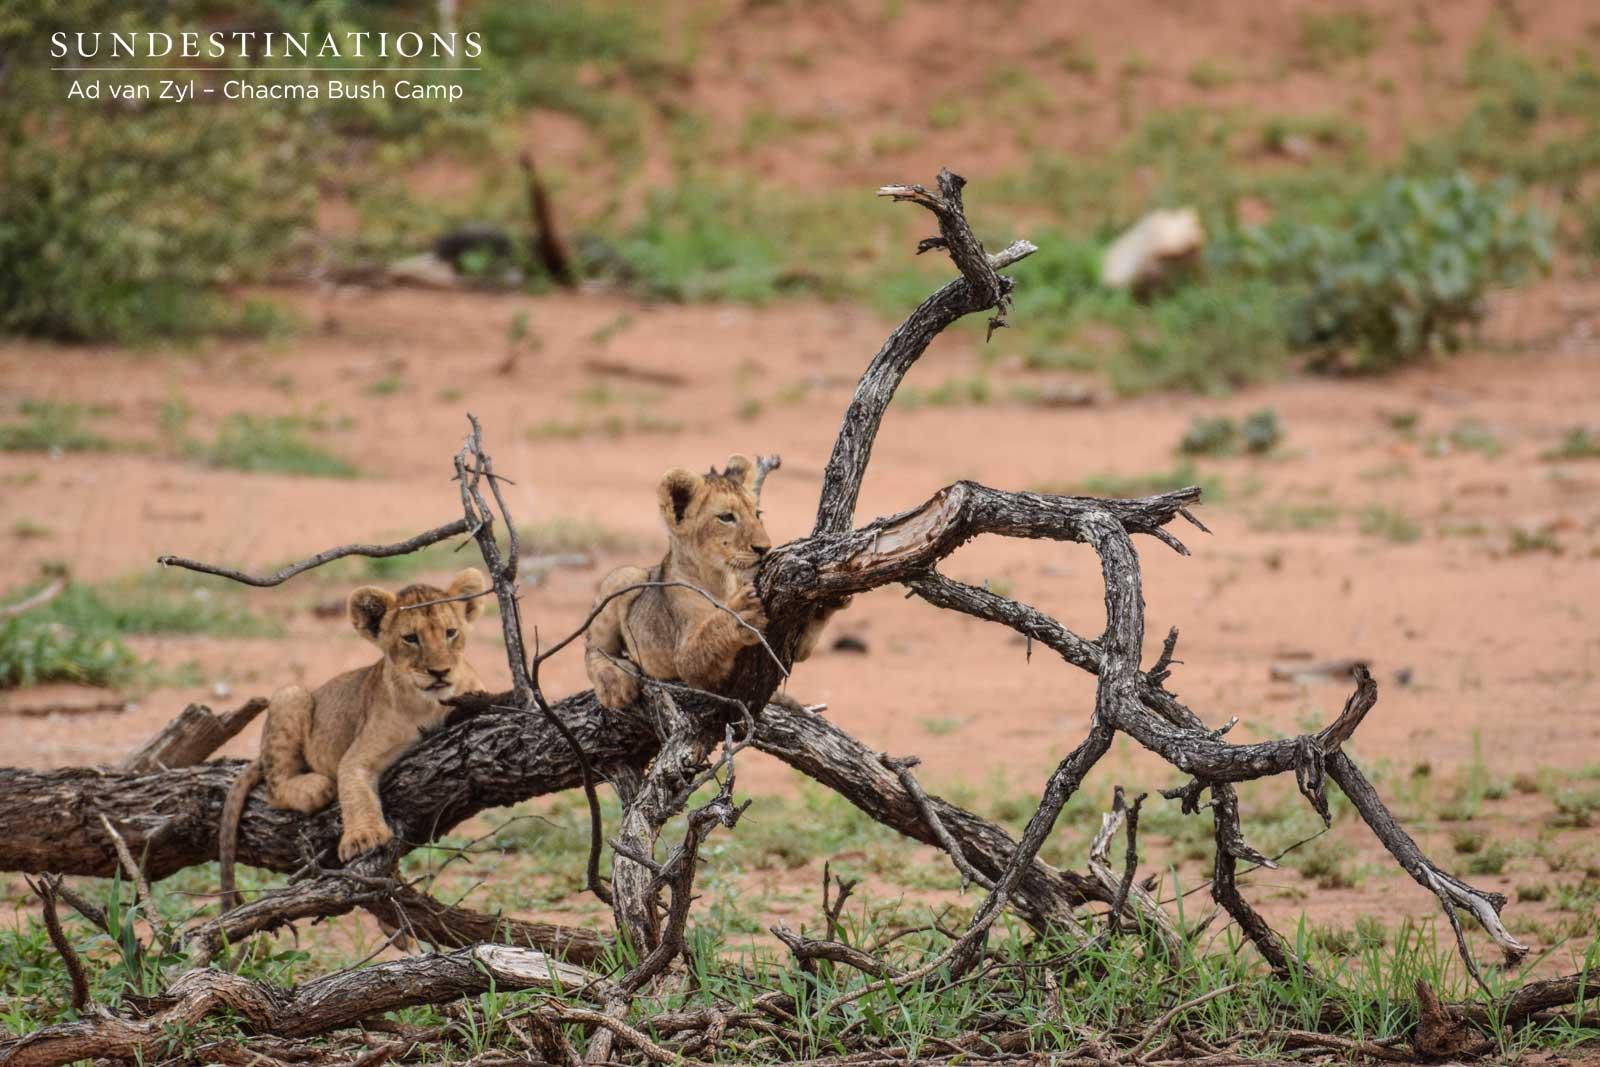 Lion Cubs at Chacma Bush Camp